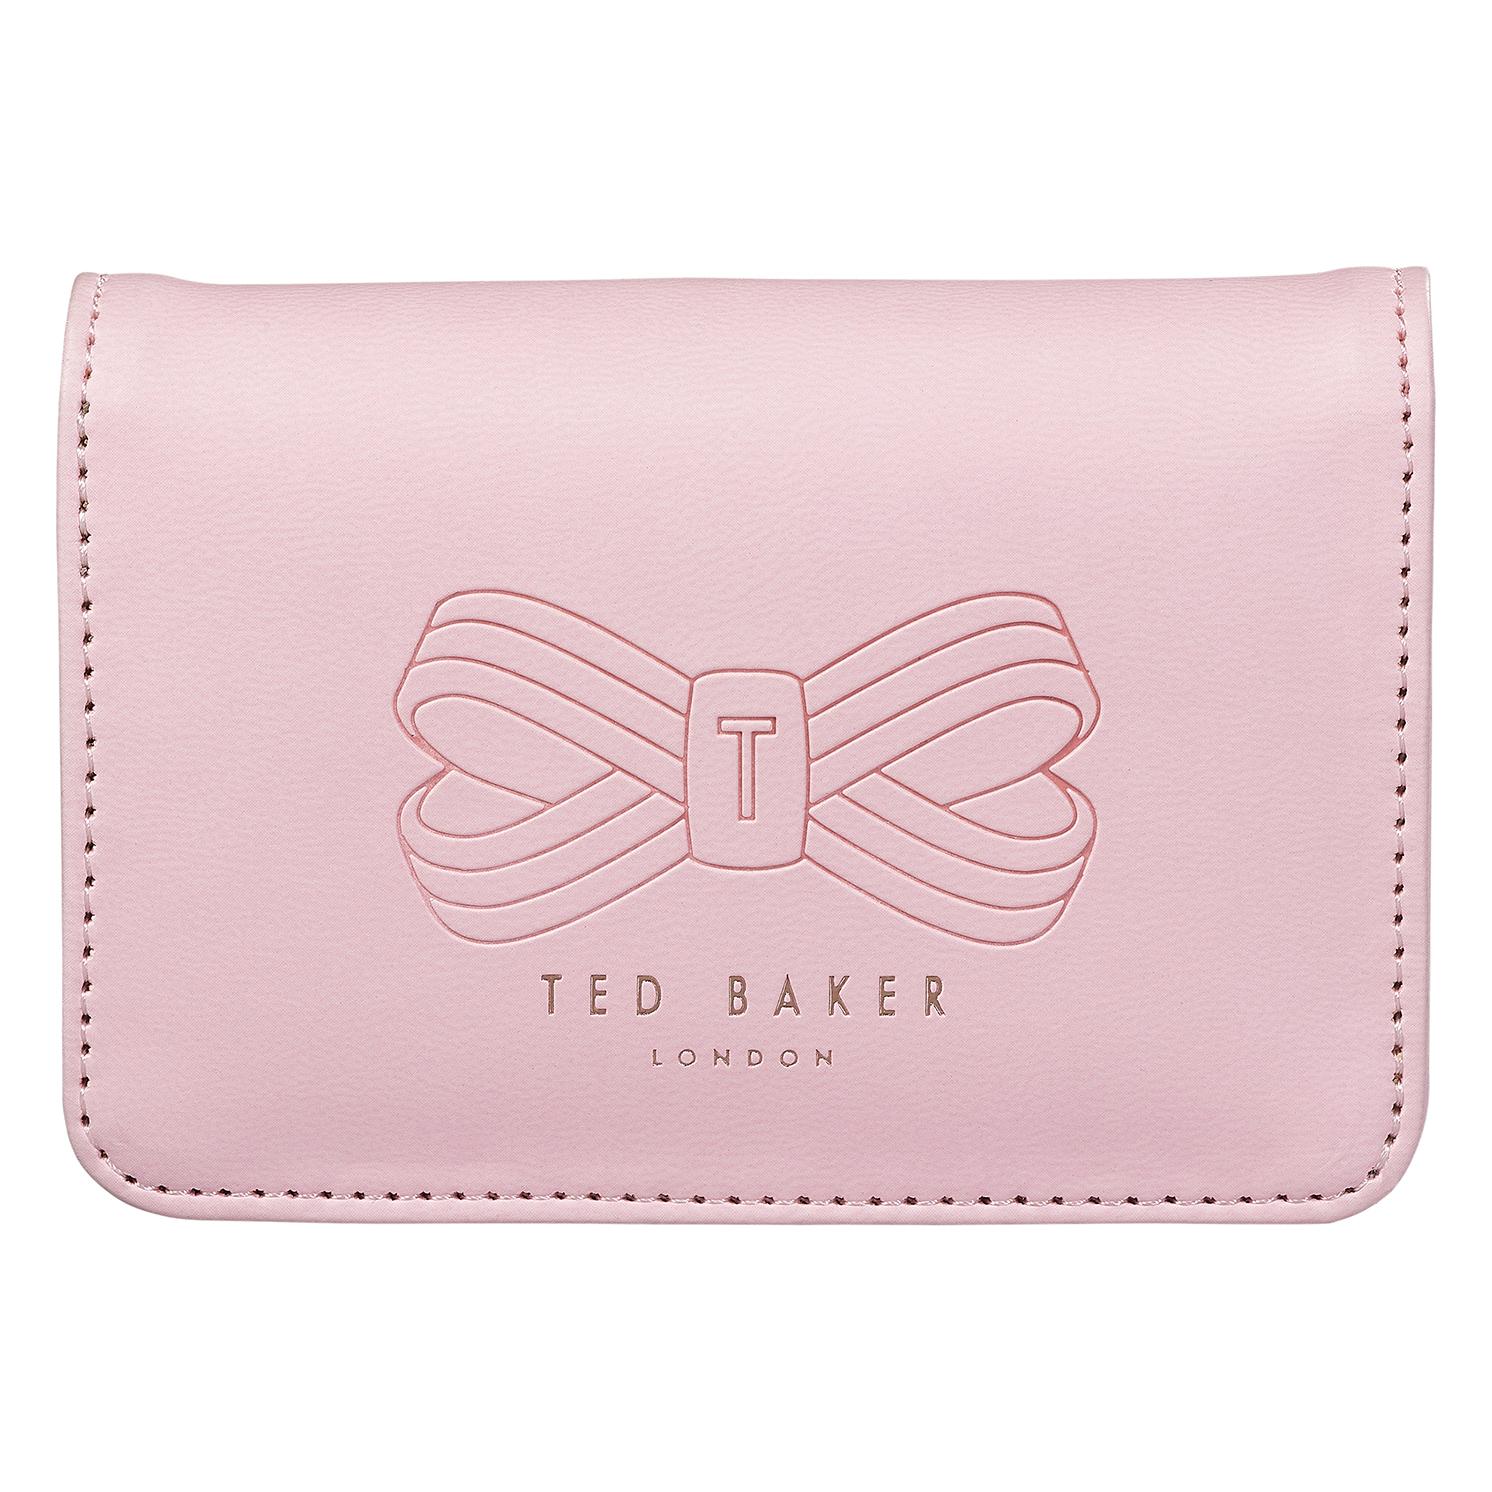 Ted Baker – 5 Piece Manicure Set in Pale Pink Zip Around Case